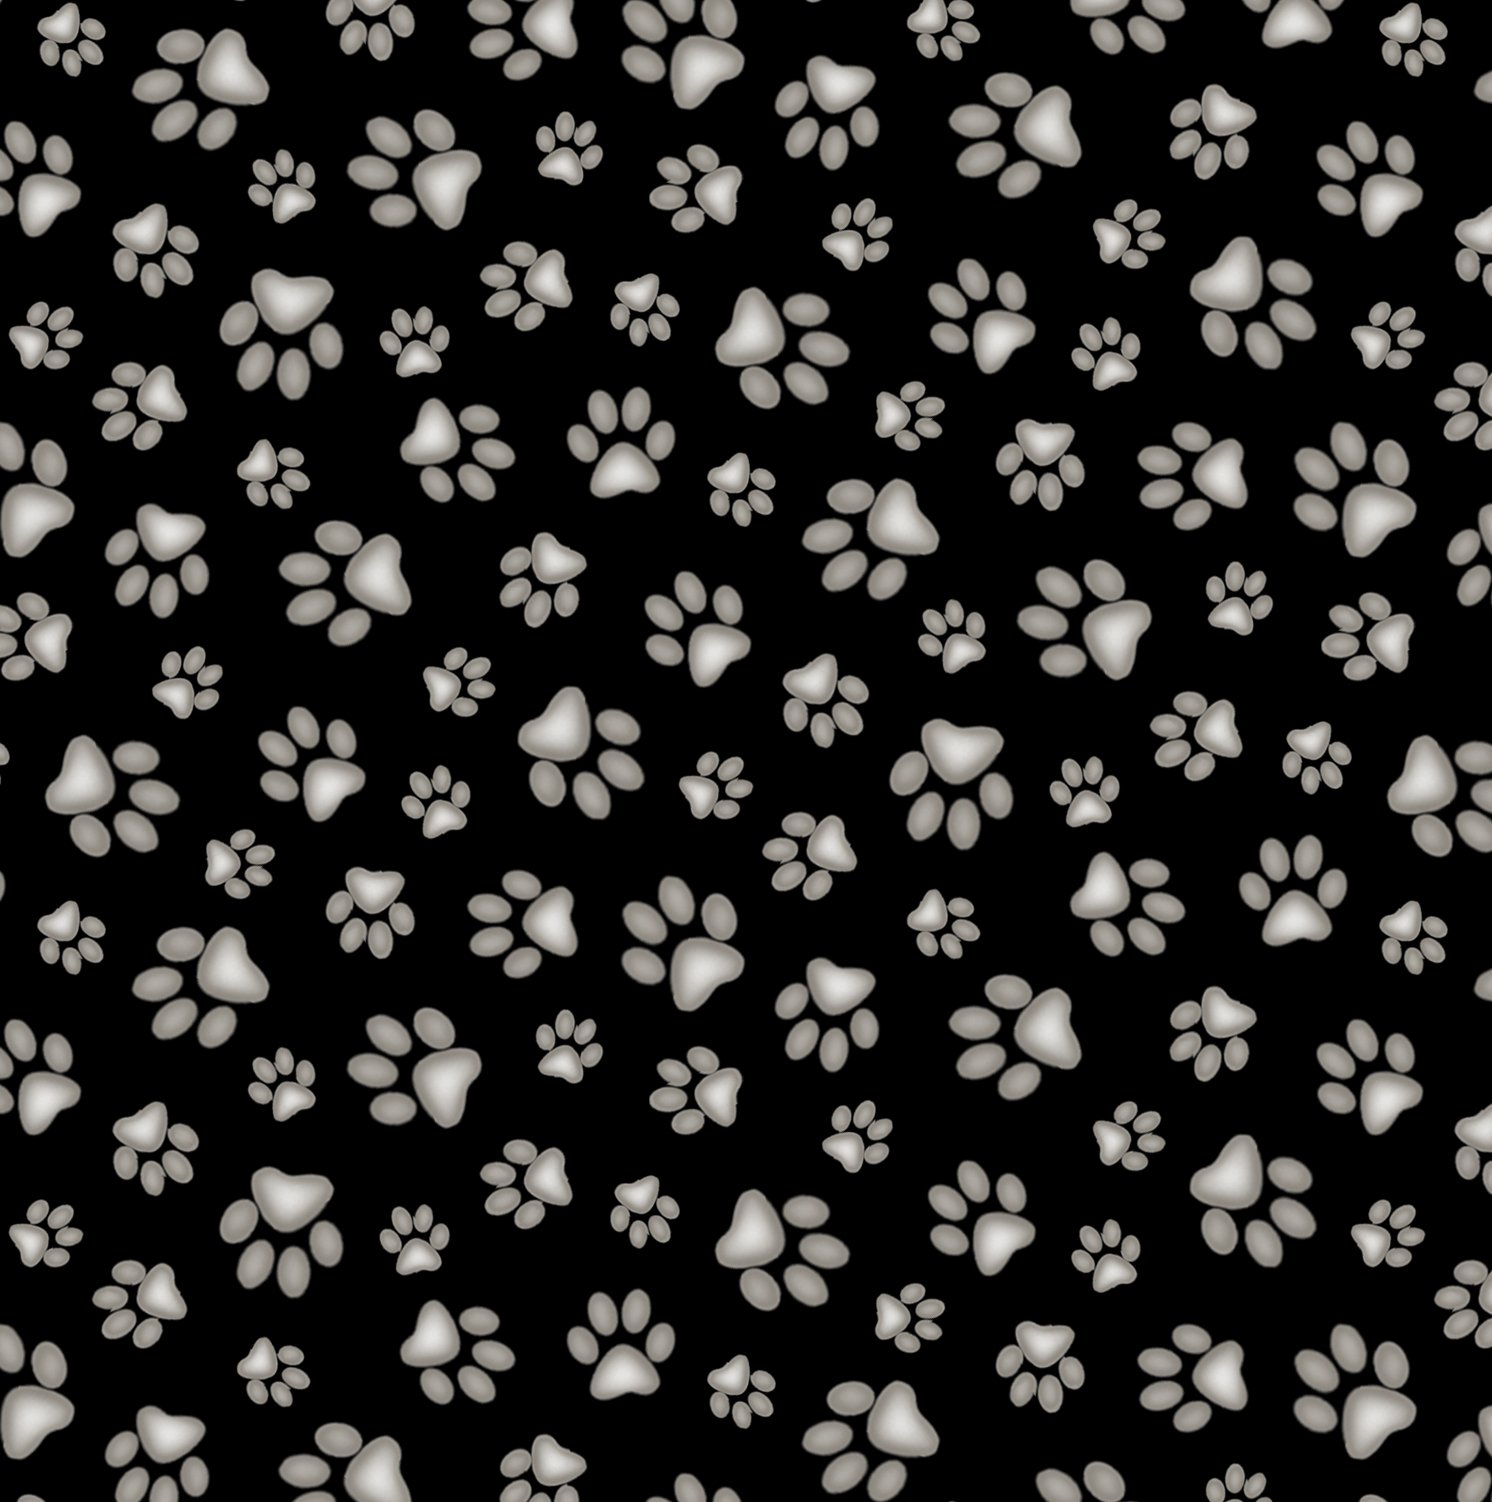 181 Black Paw Print